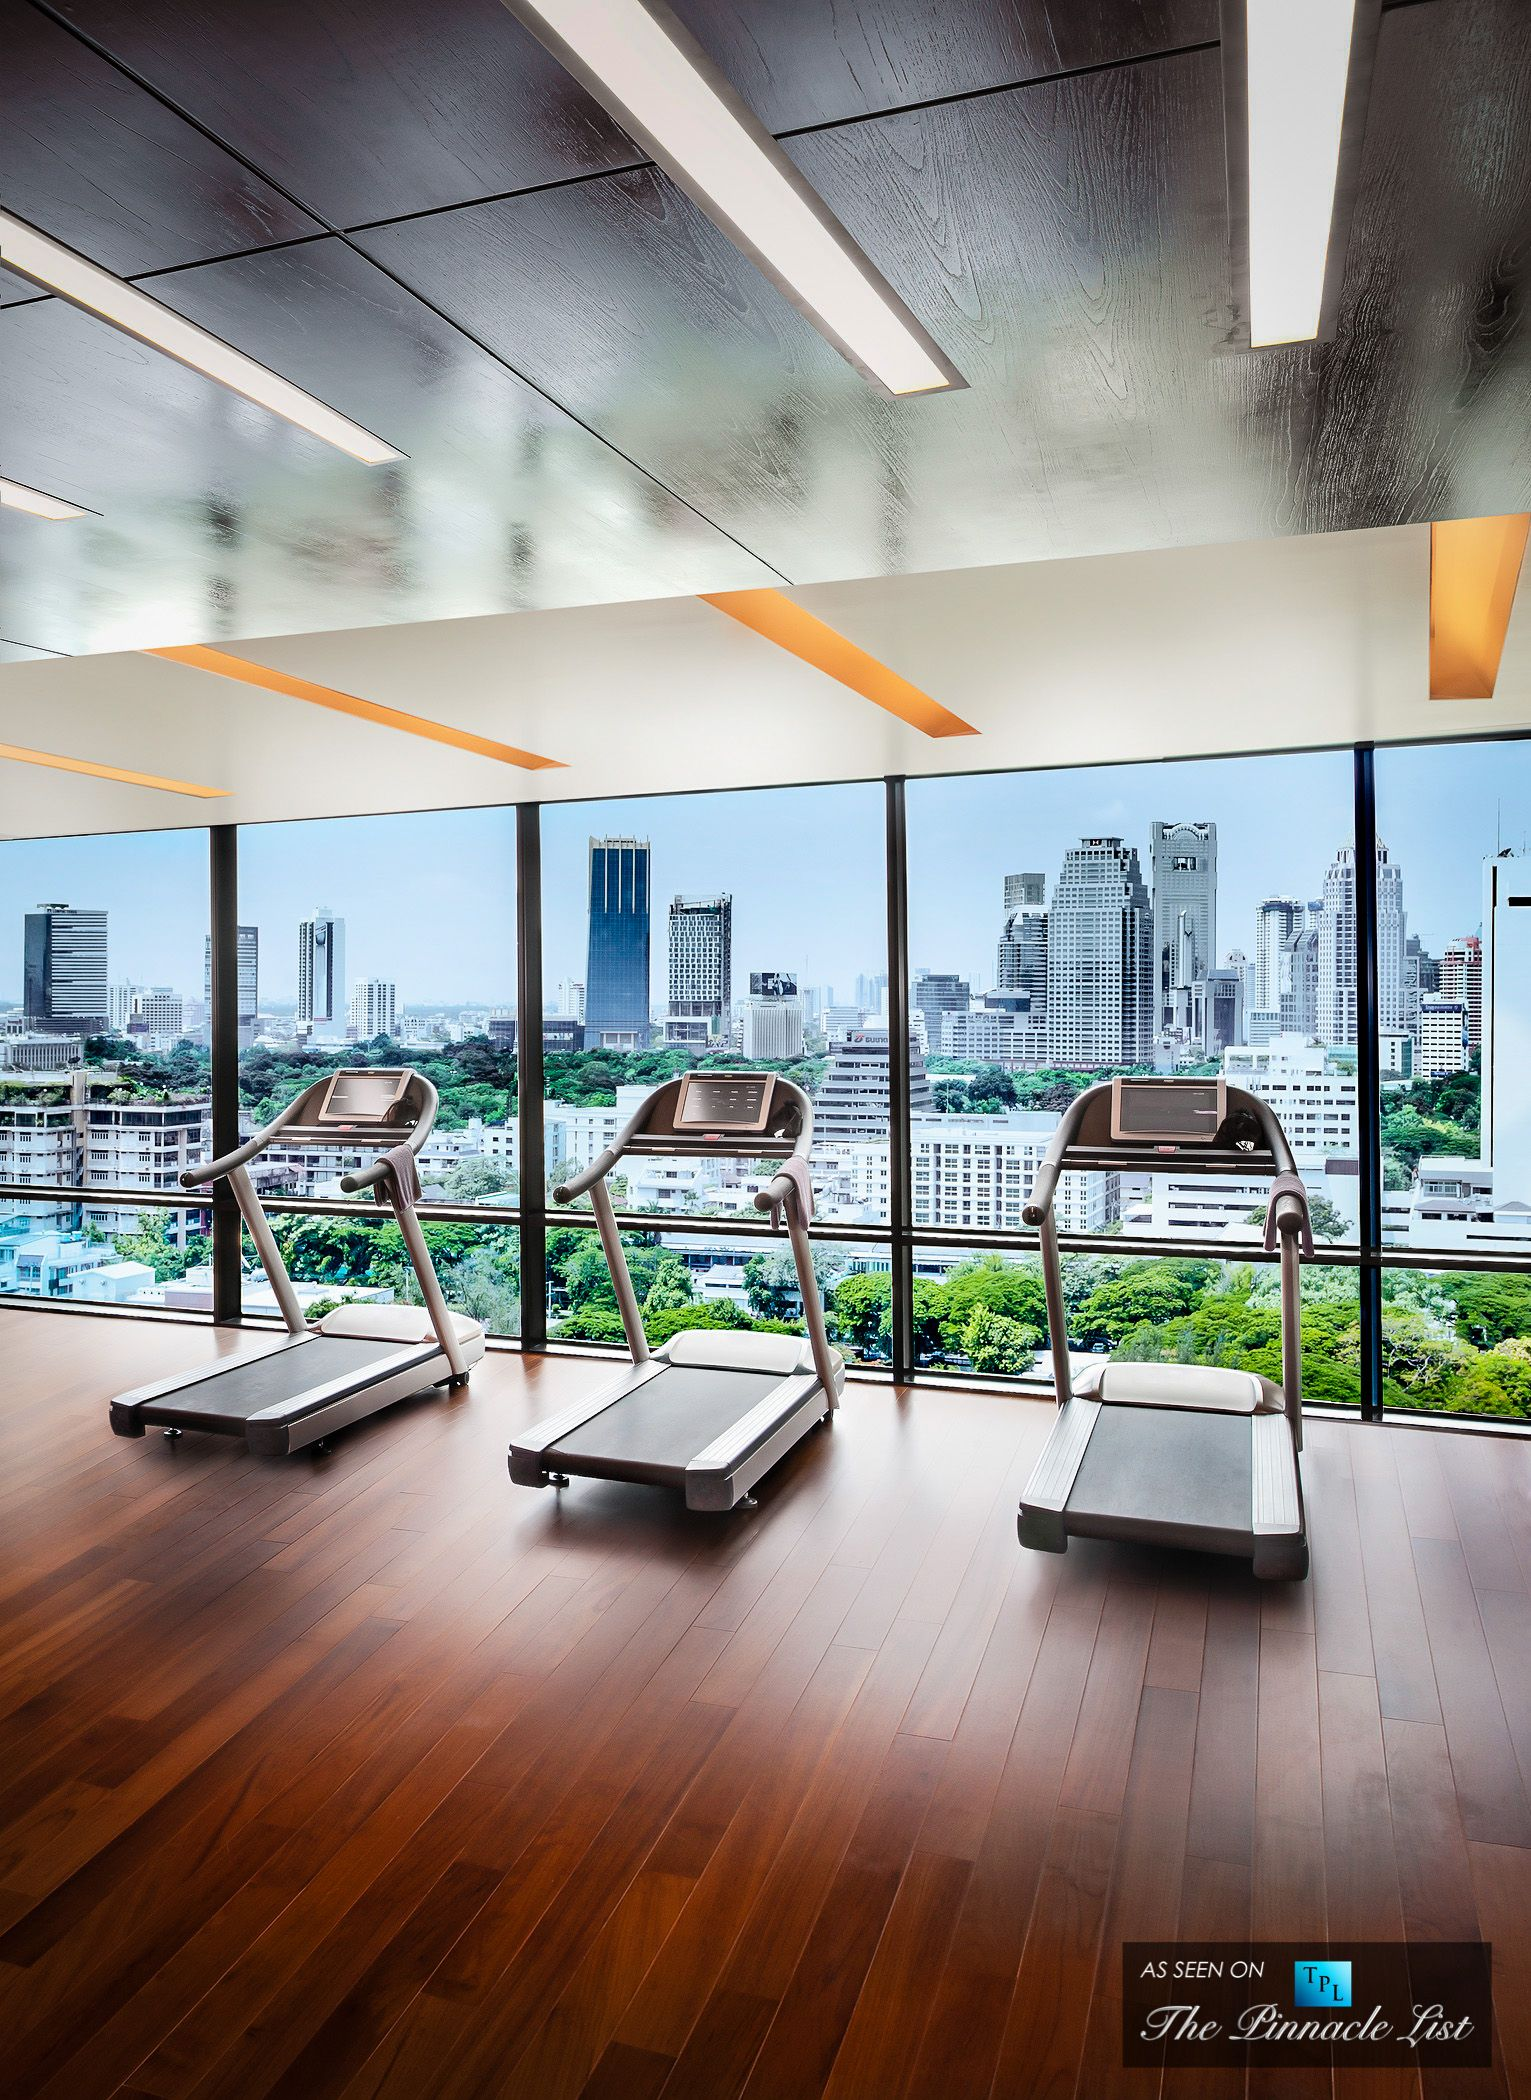 St Regis Luxury Hotel Bangkok Thailand Fitness Center